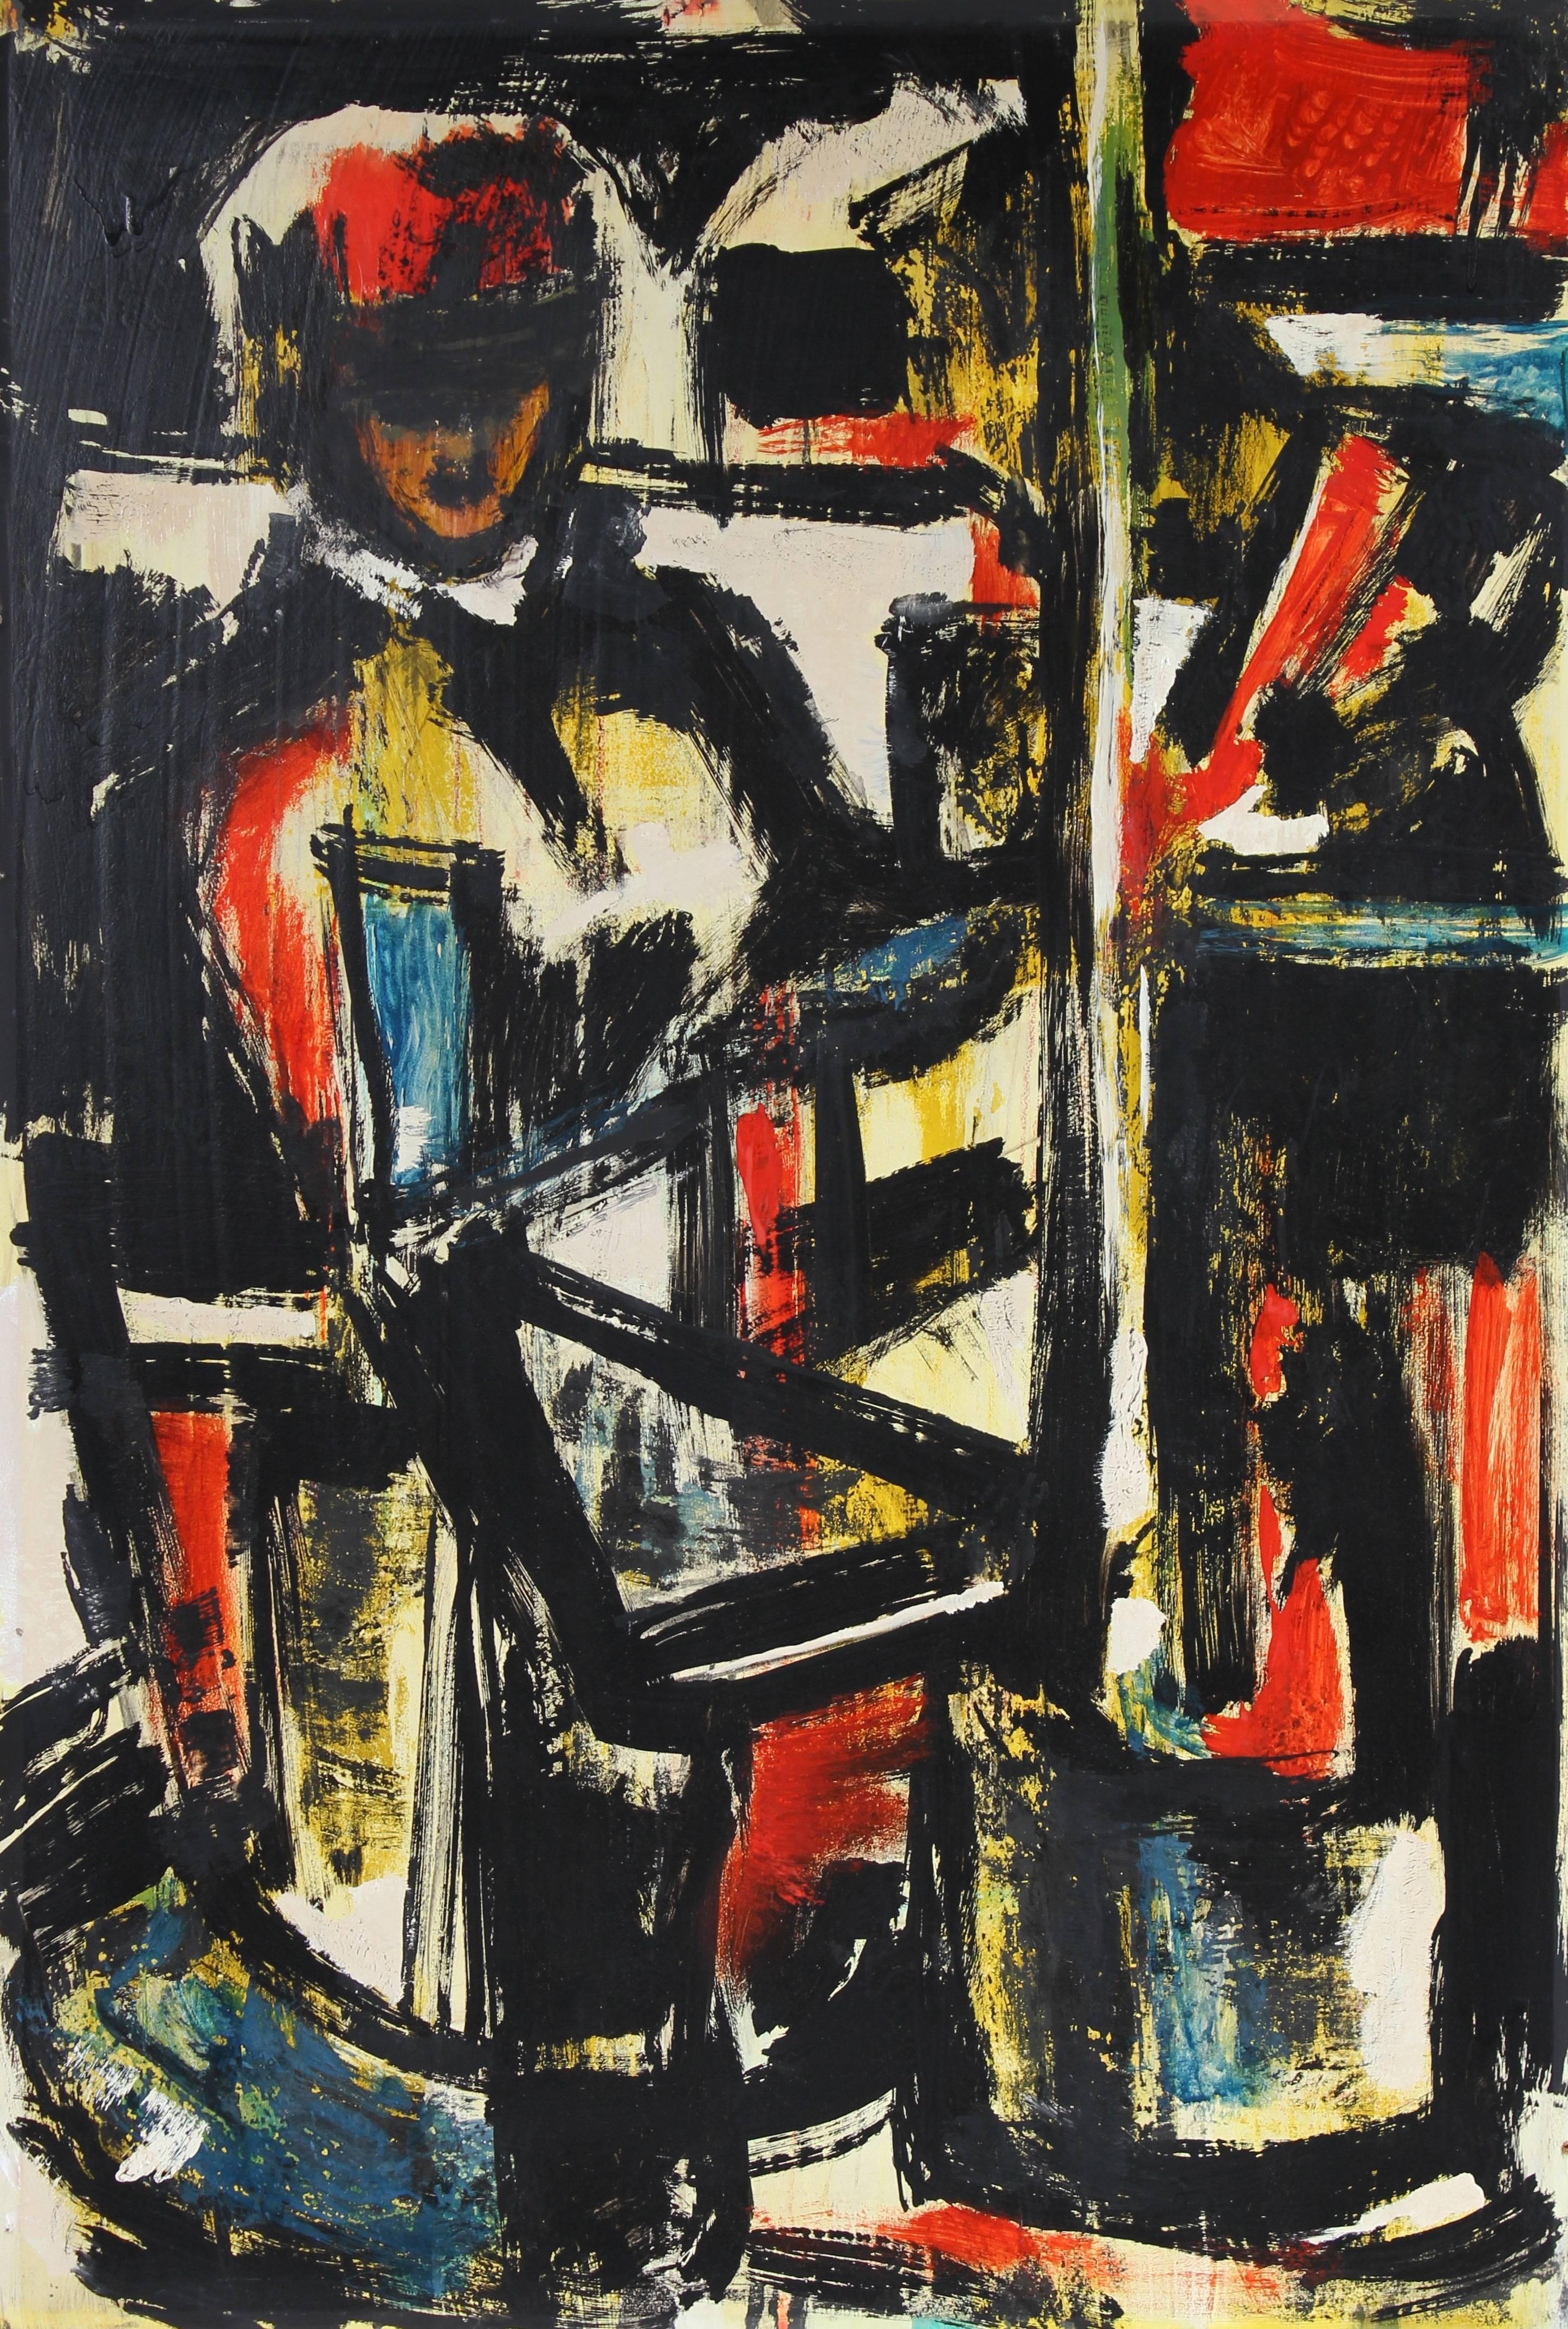 Mid Century Expressionist Portrait Painting, Circa 1950